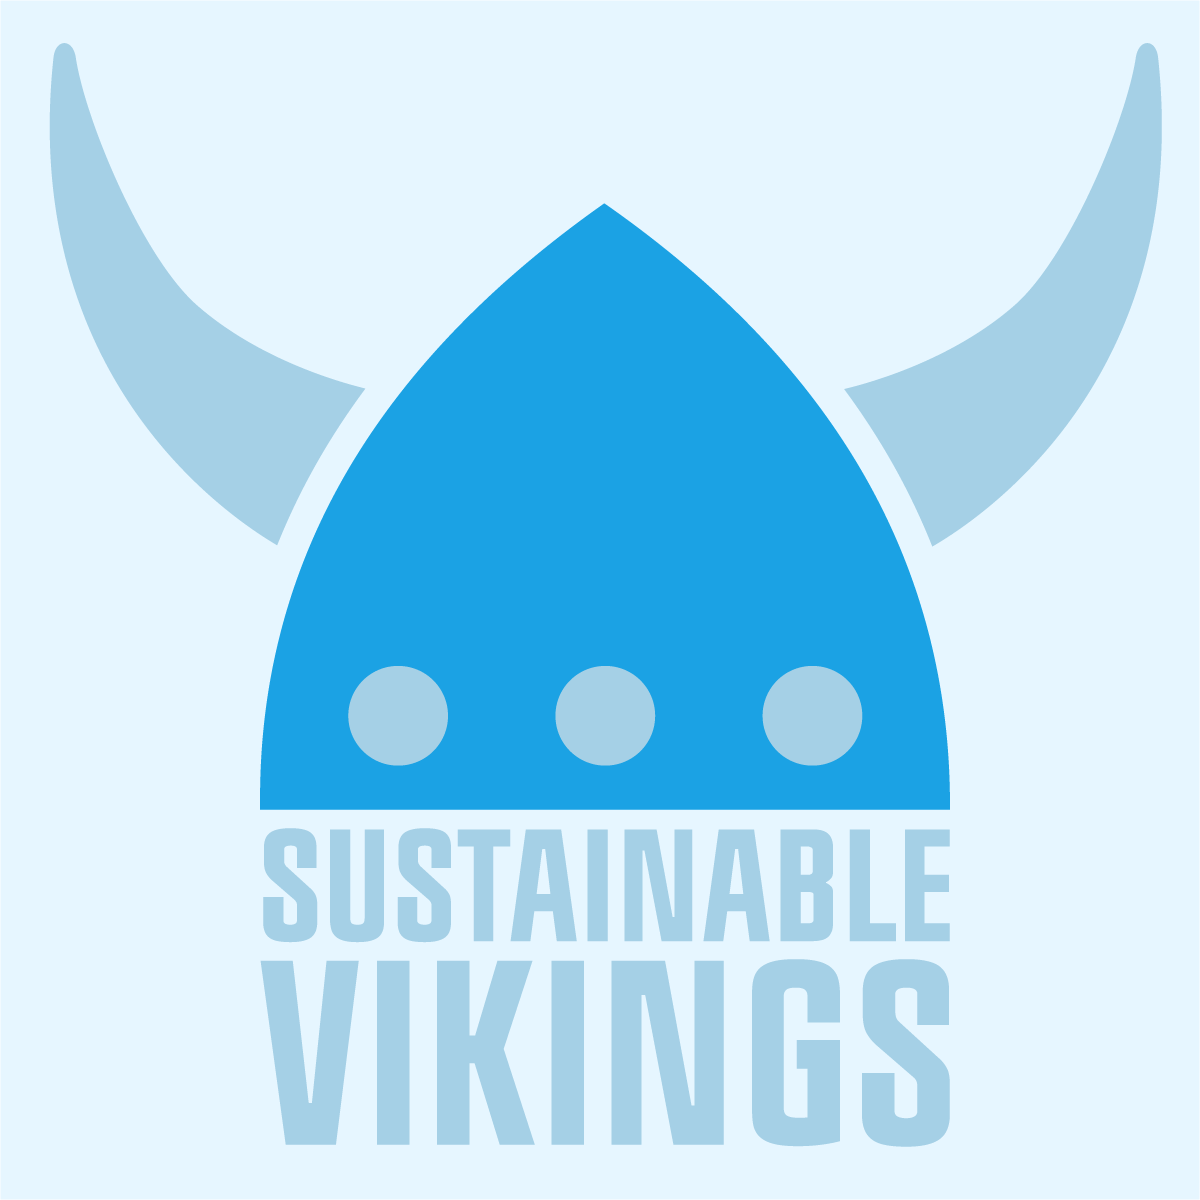 Sustainable Vikings: Sustainability & Corporate Social